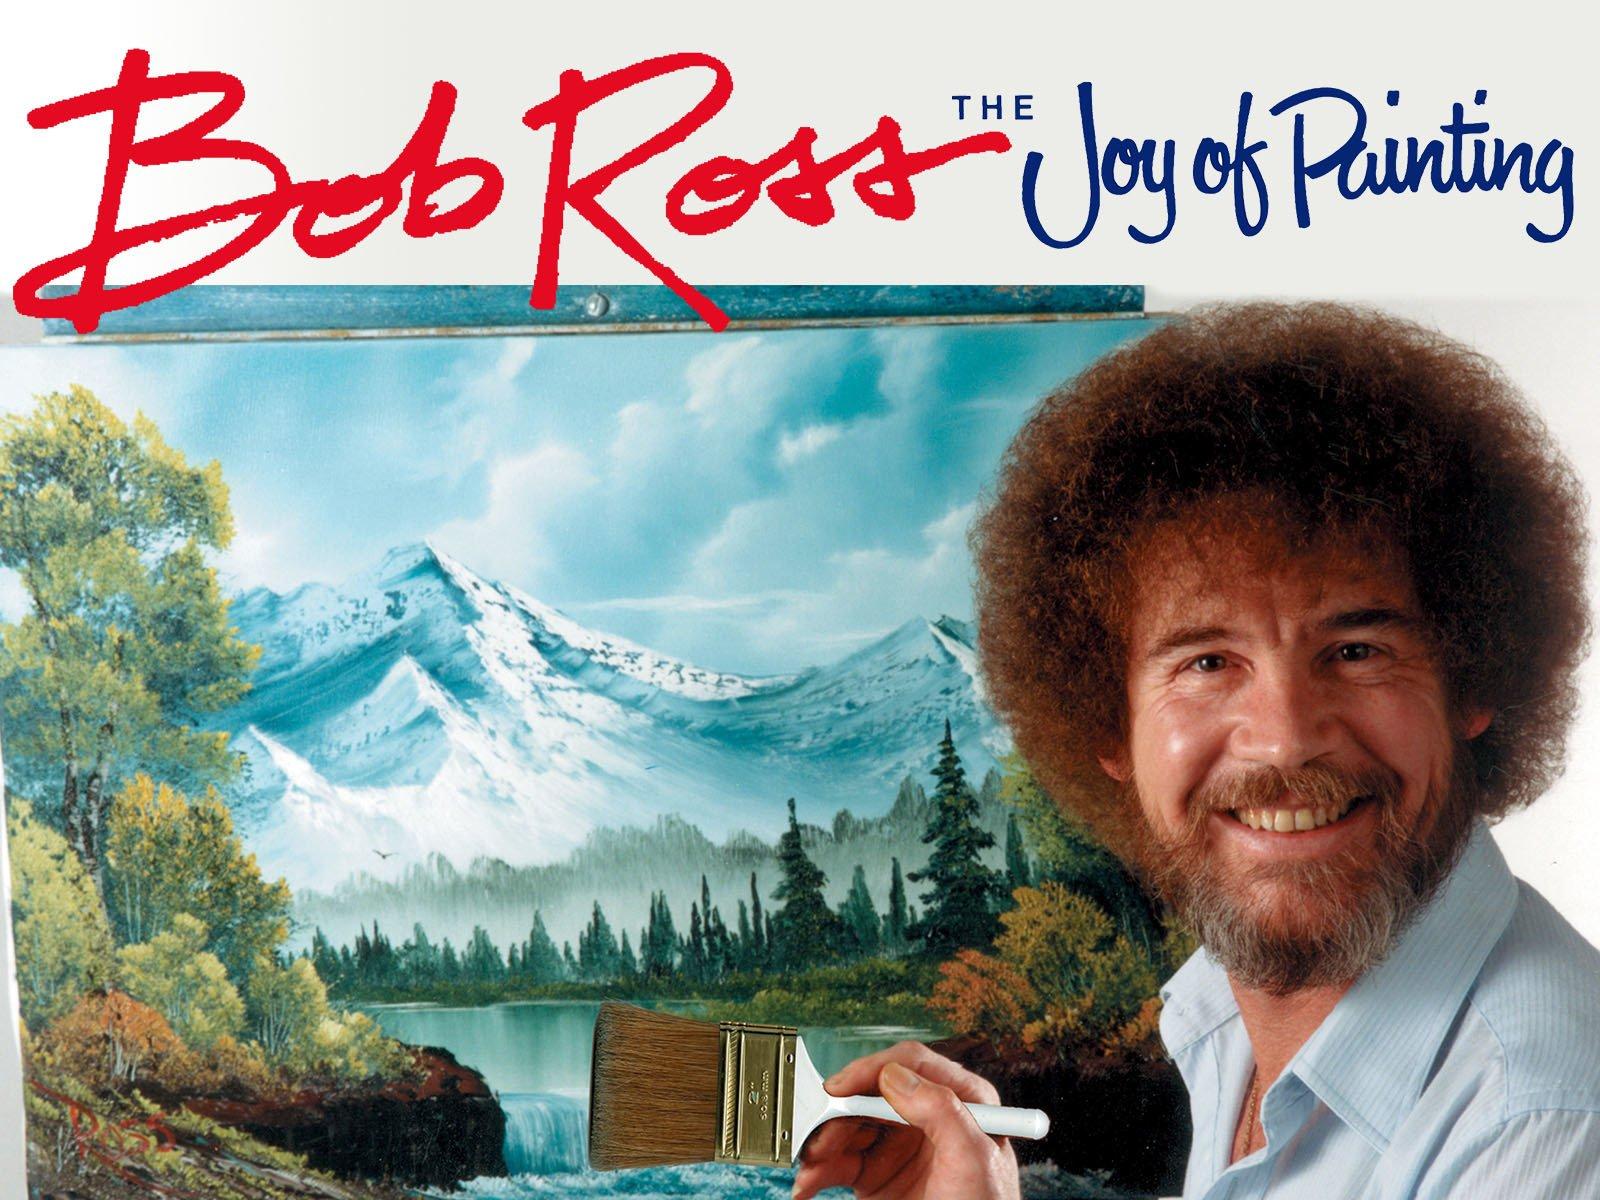 Bob Ross: The Joy of Painting - Season 26